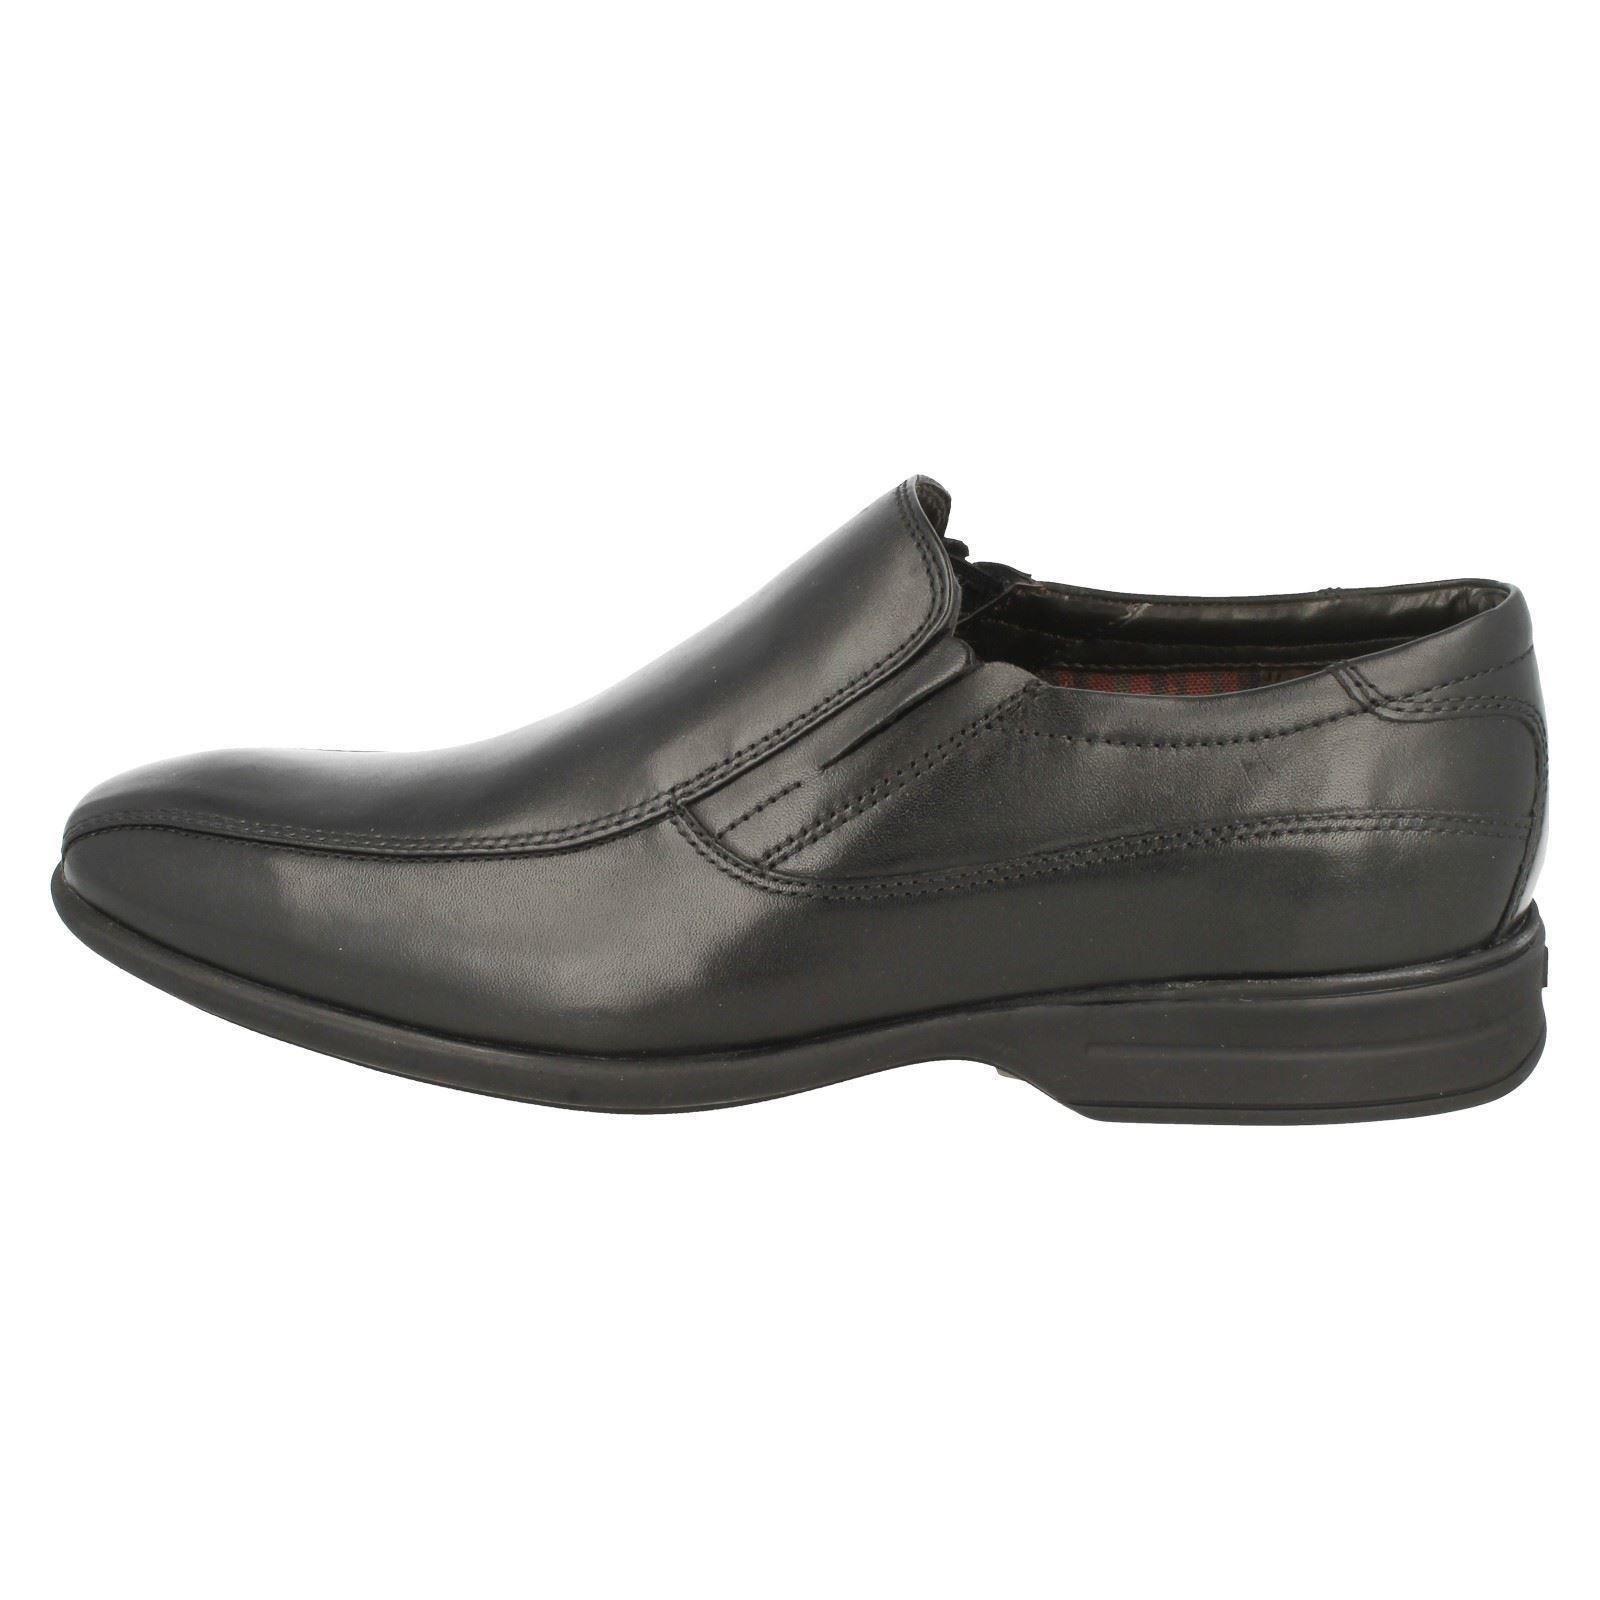 Mens 'Gadwell Clarks Slip On Schuhes 'Gadwell Mens Stride' 4b3d9e